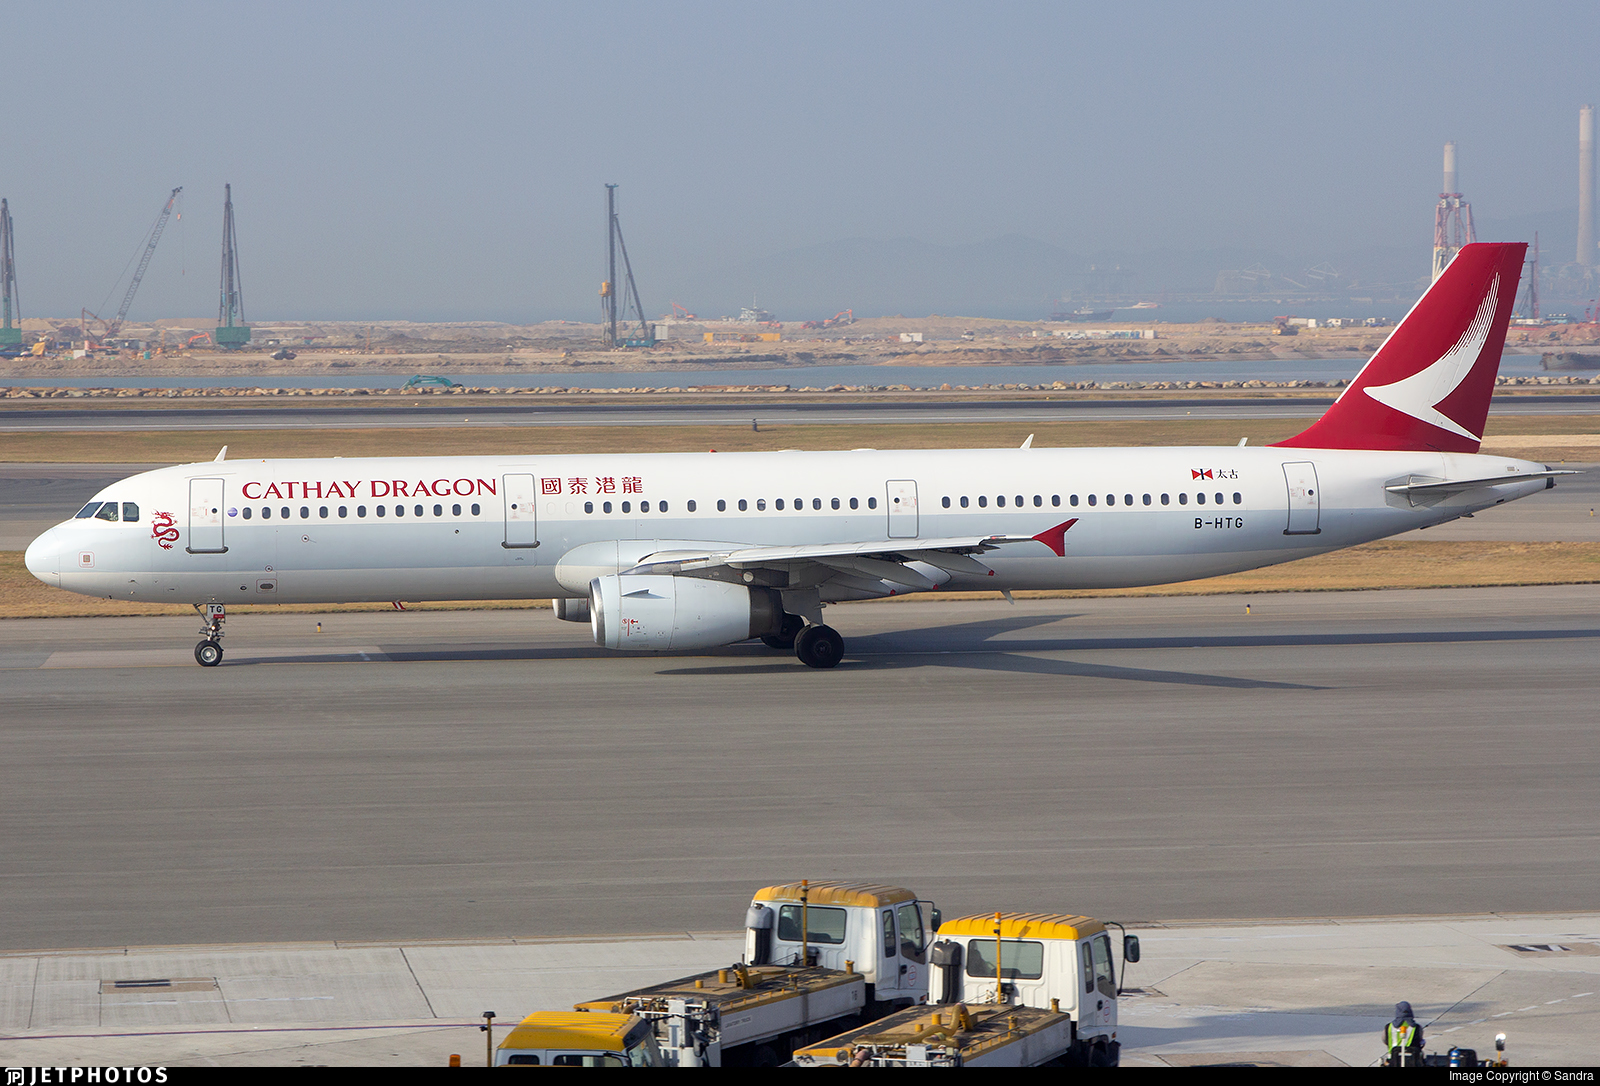 B-HTG - Airbus A321-231 - Cathay Dragon